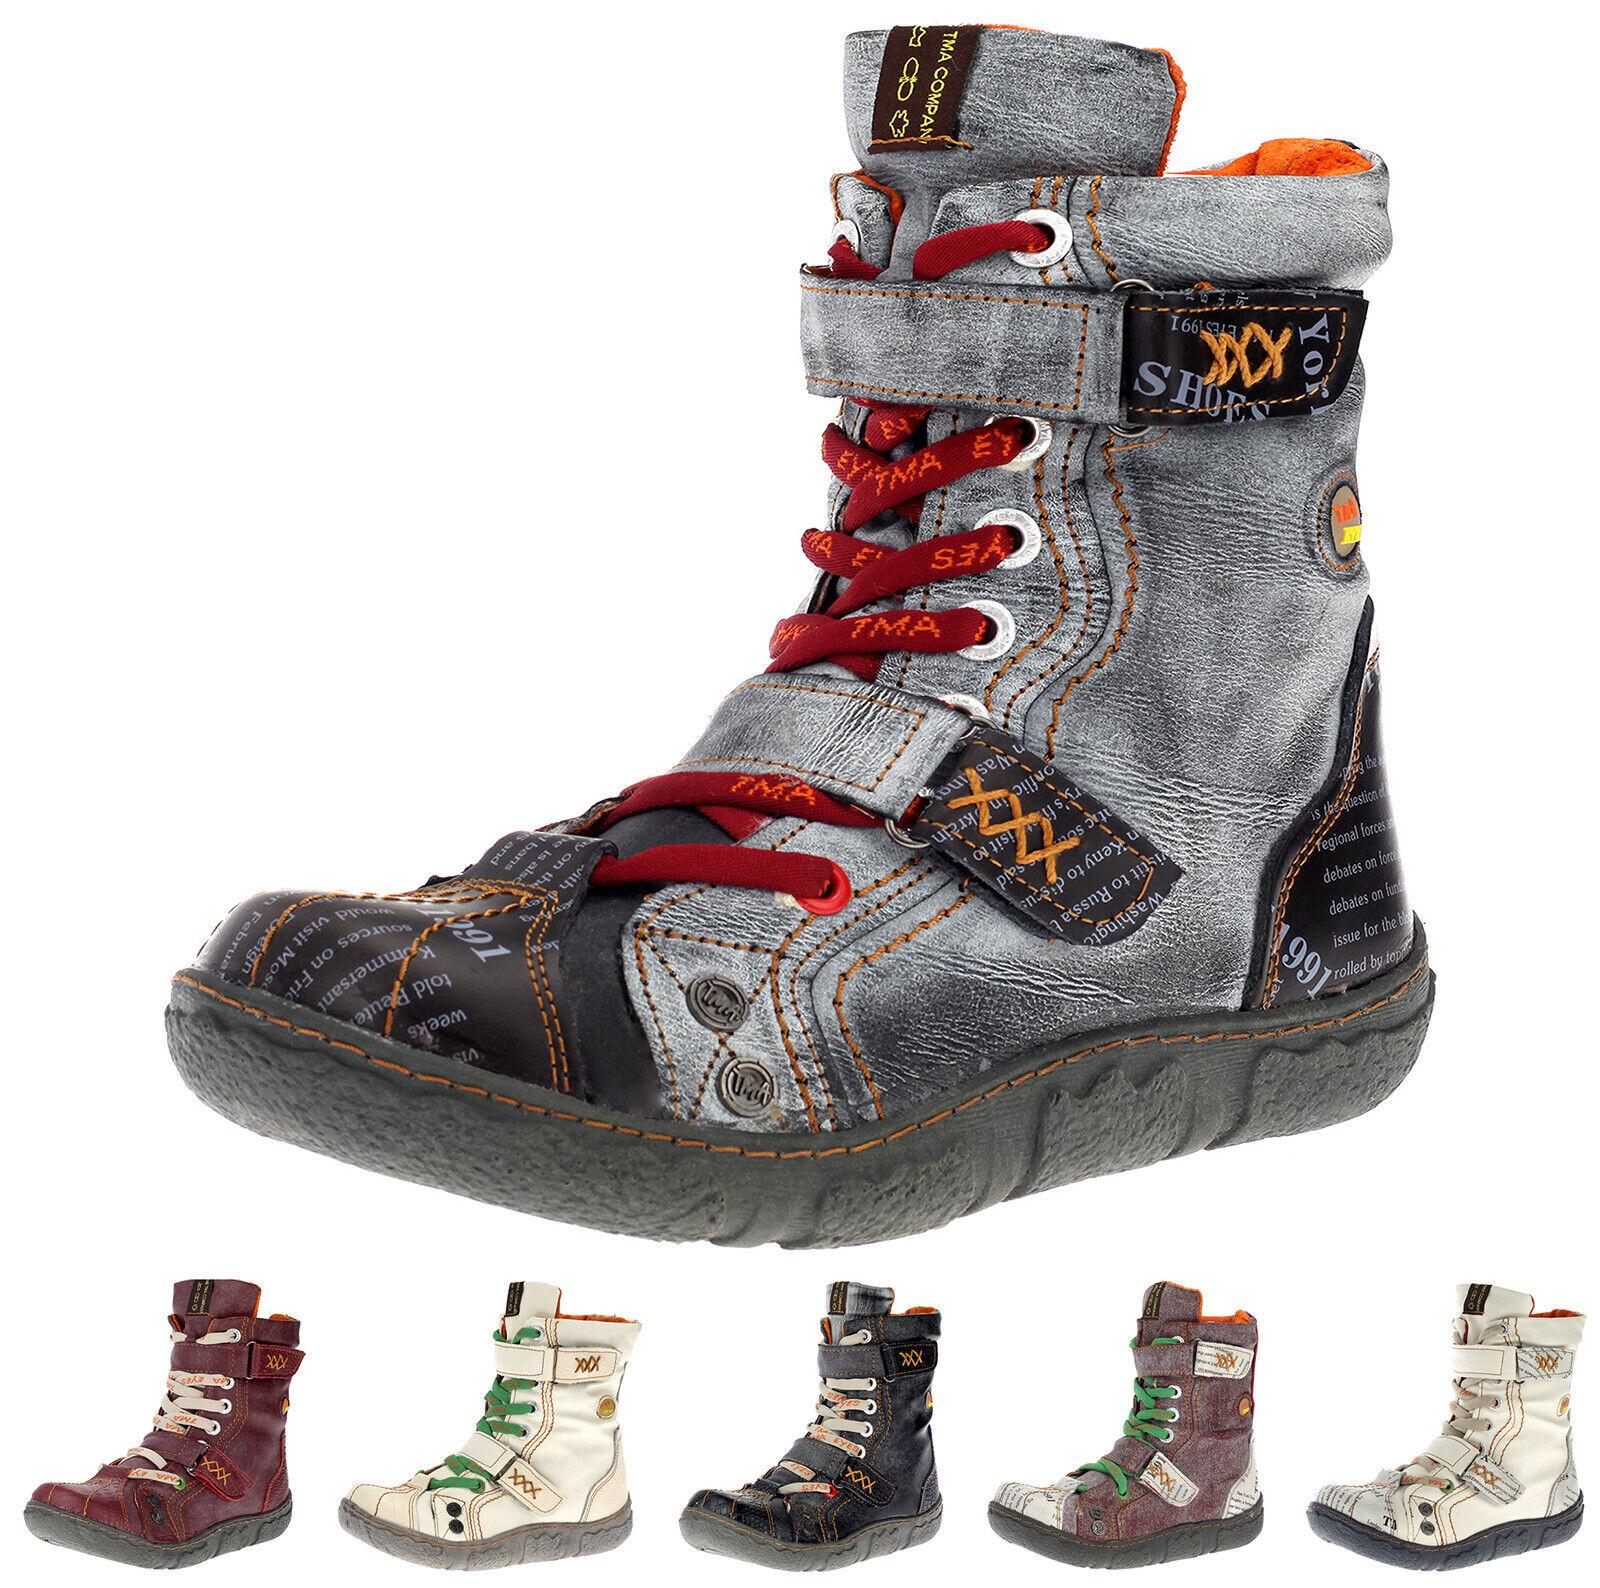 TMA Damen Stiefeletten WinterStiefel Winterstiefel Warmfutter Freizeit Schuhe 7087